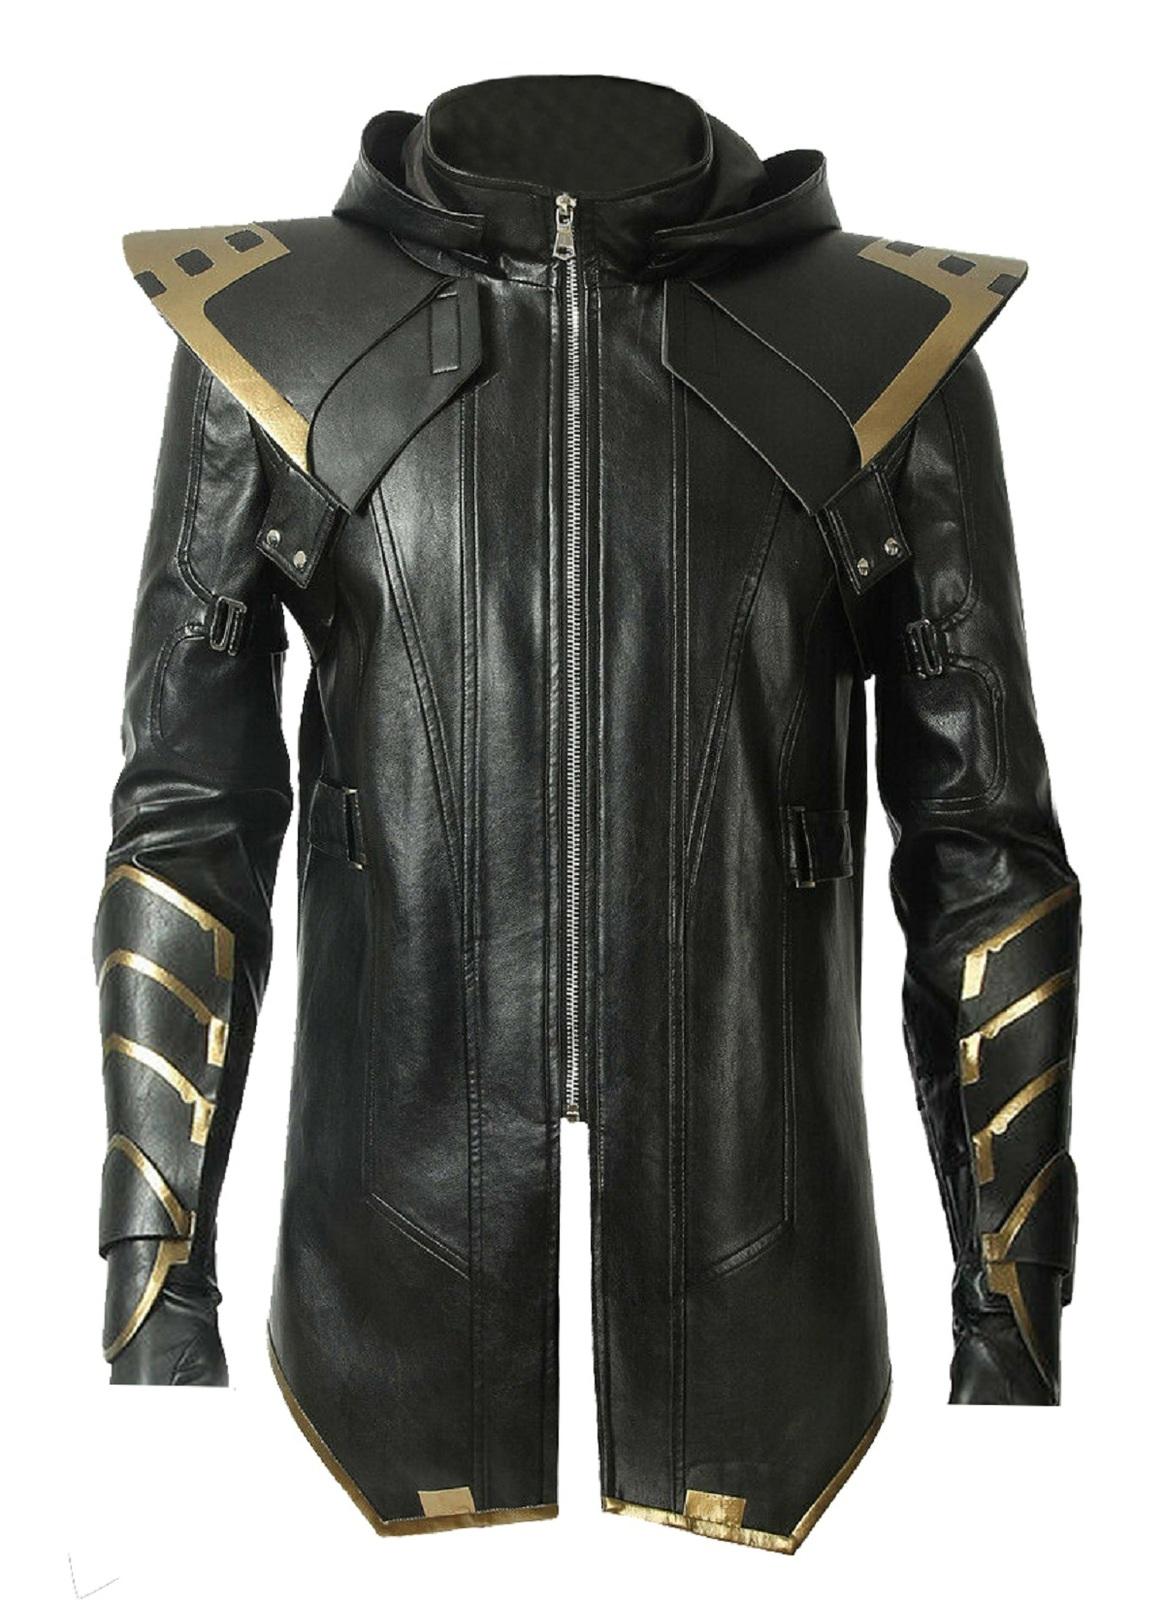 Avengers endgame ronin hawkeye black leahter jacket 1